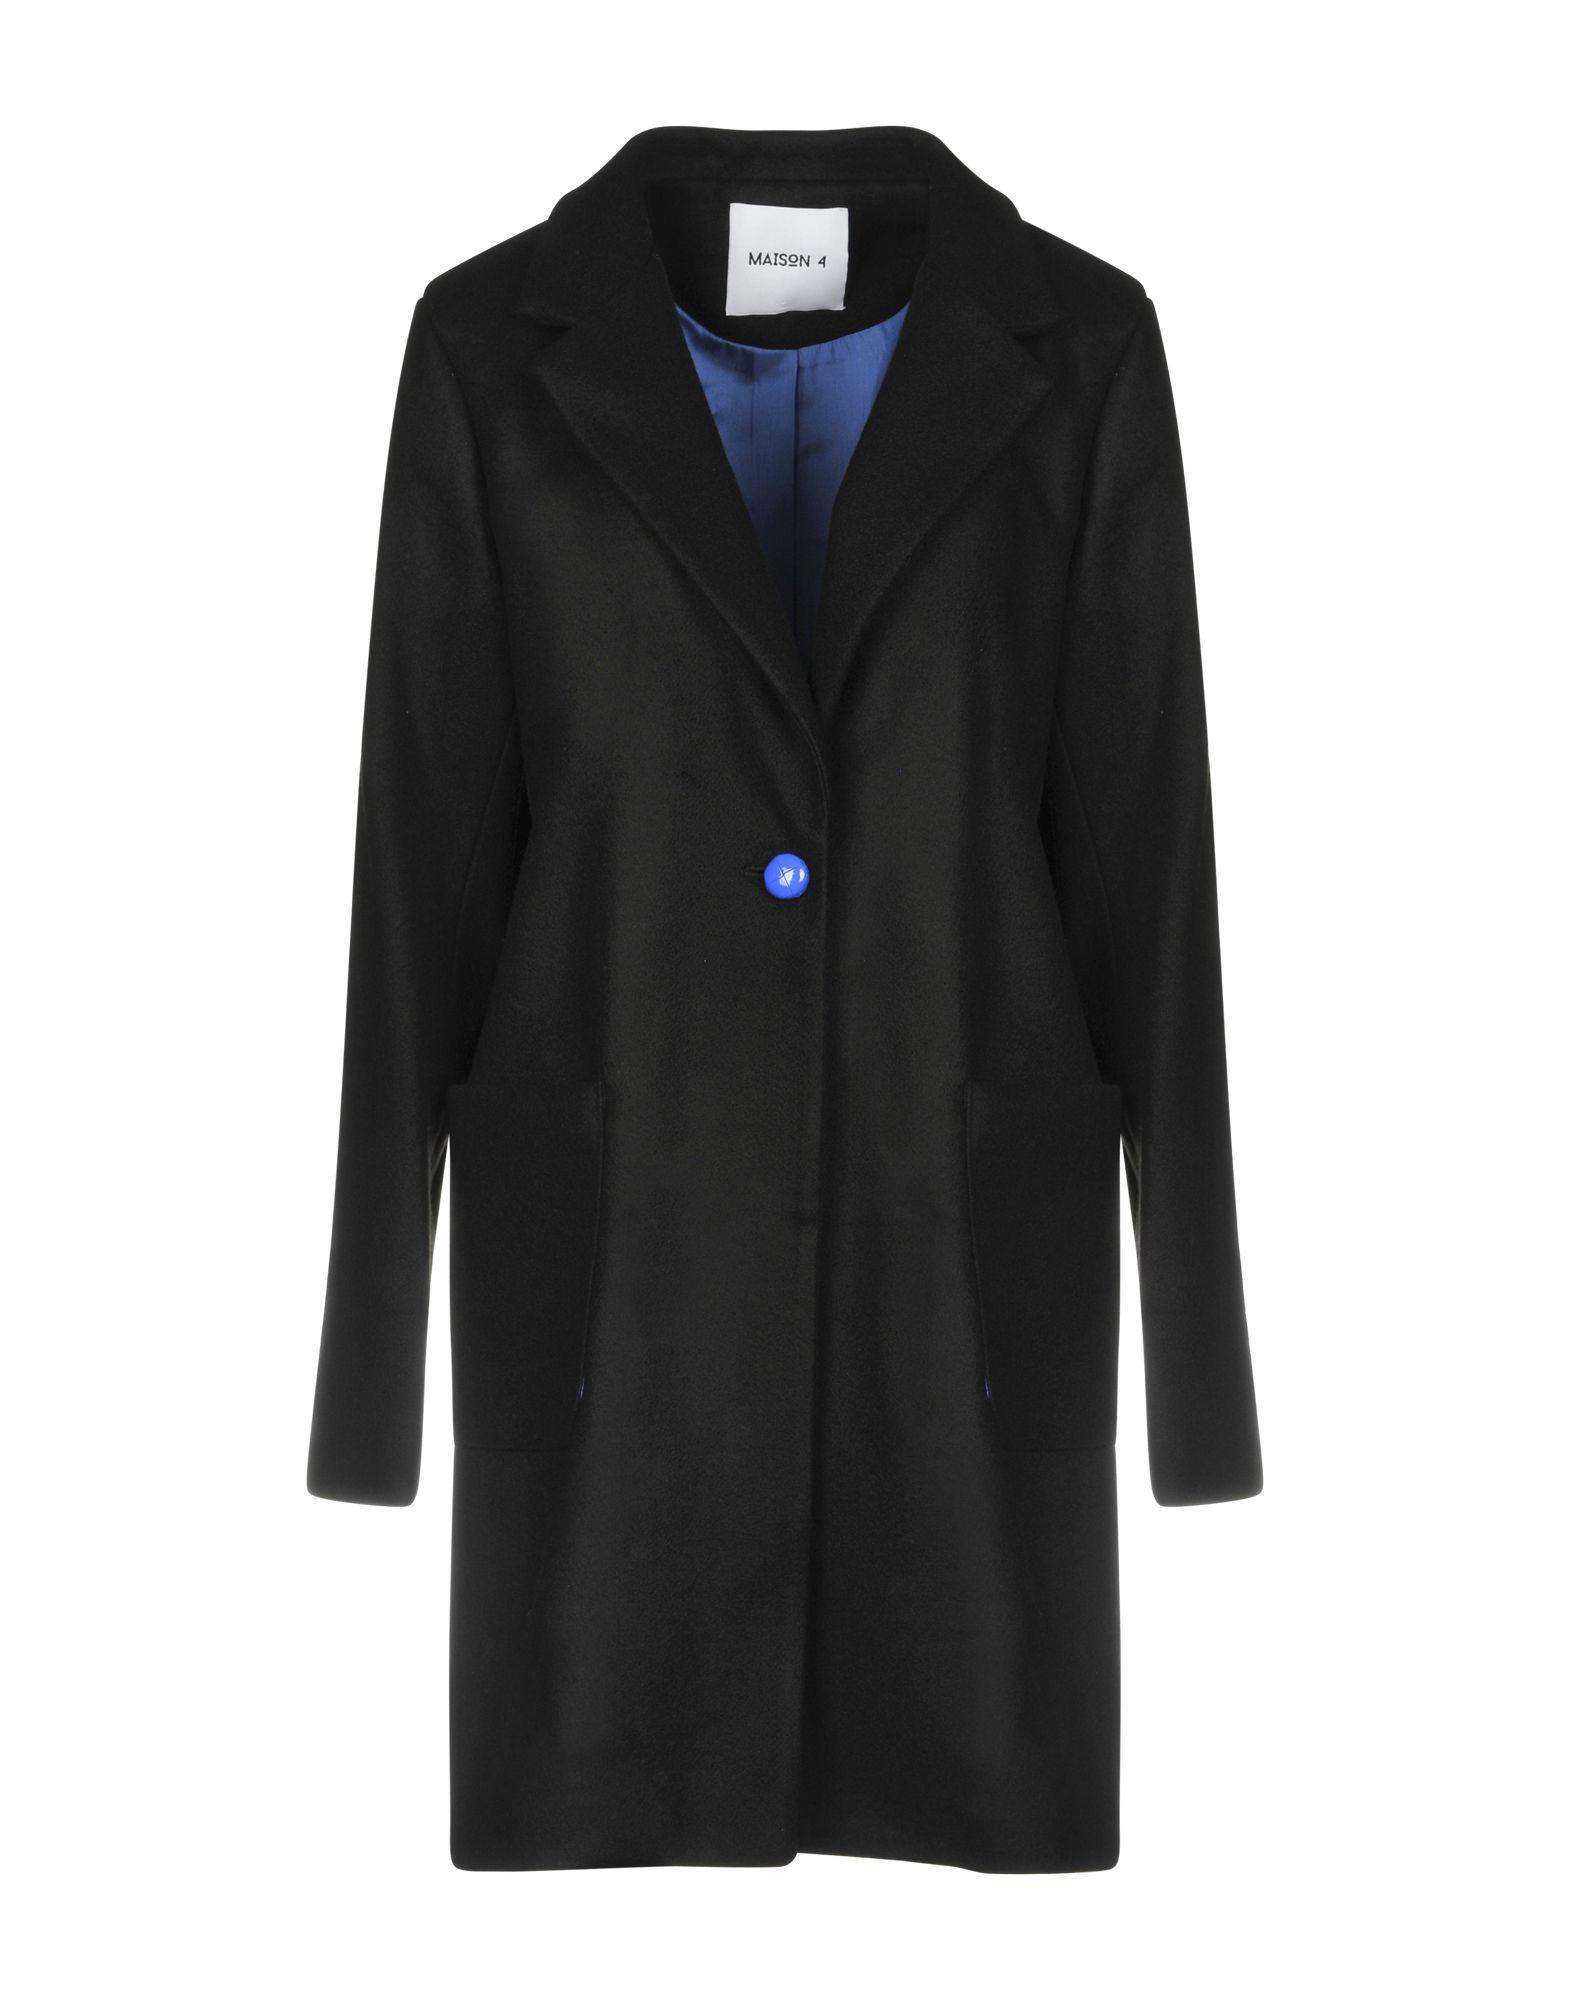 MAISON 4 Пальто